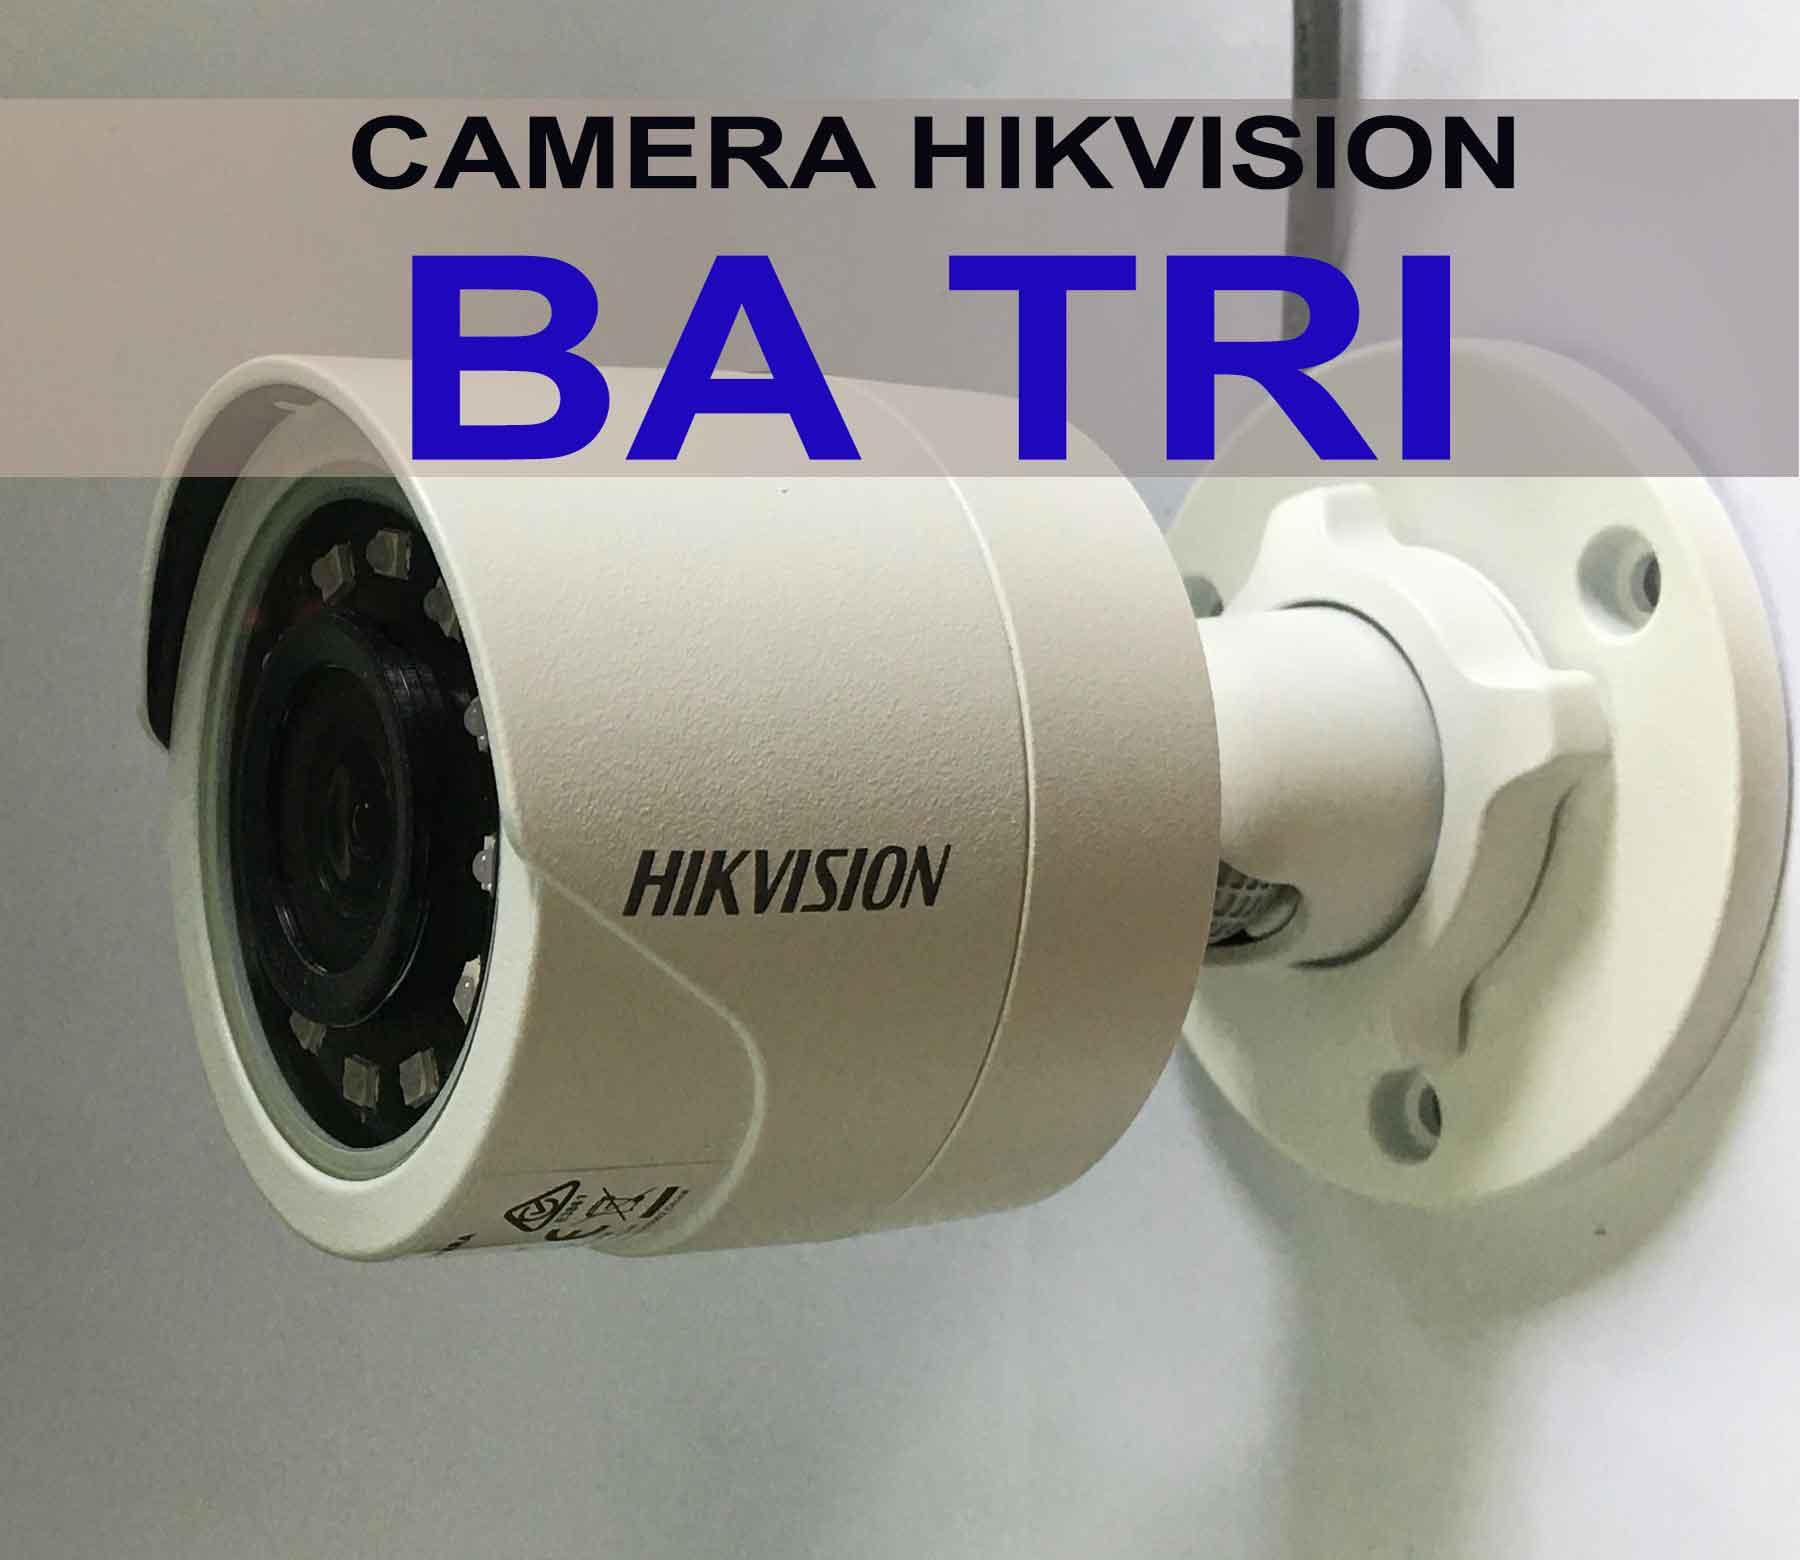 Camera wifi hikvision ba tri